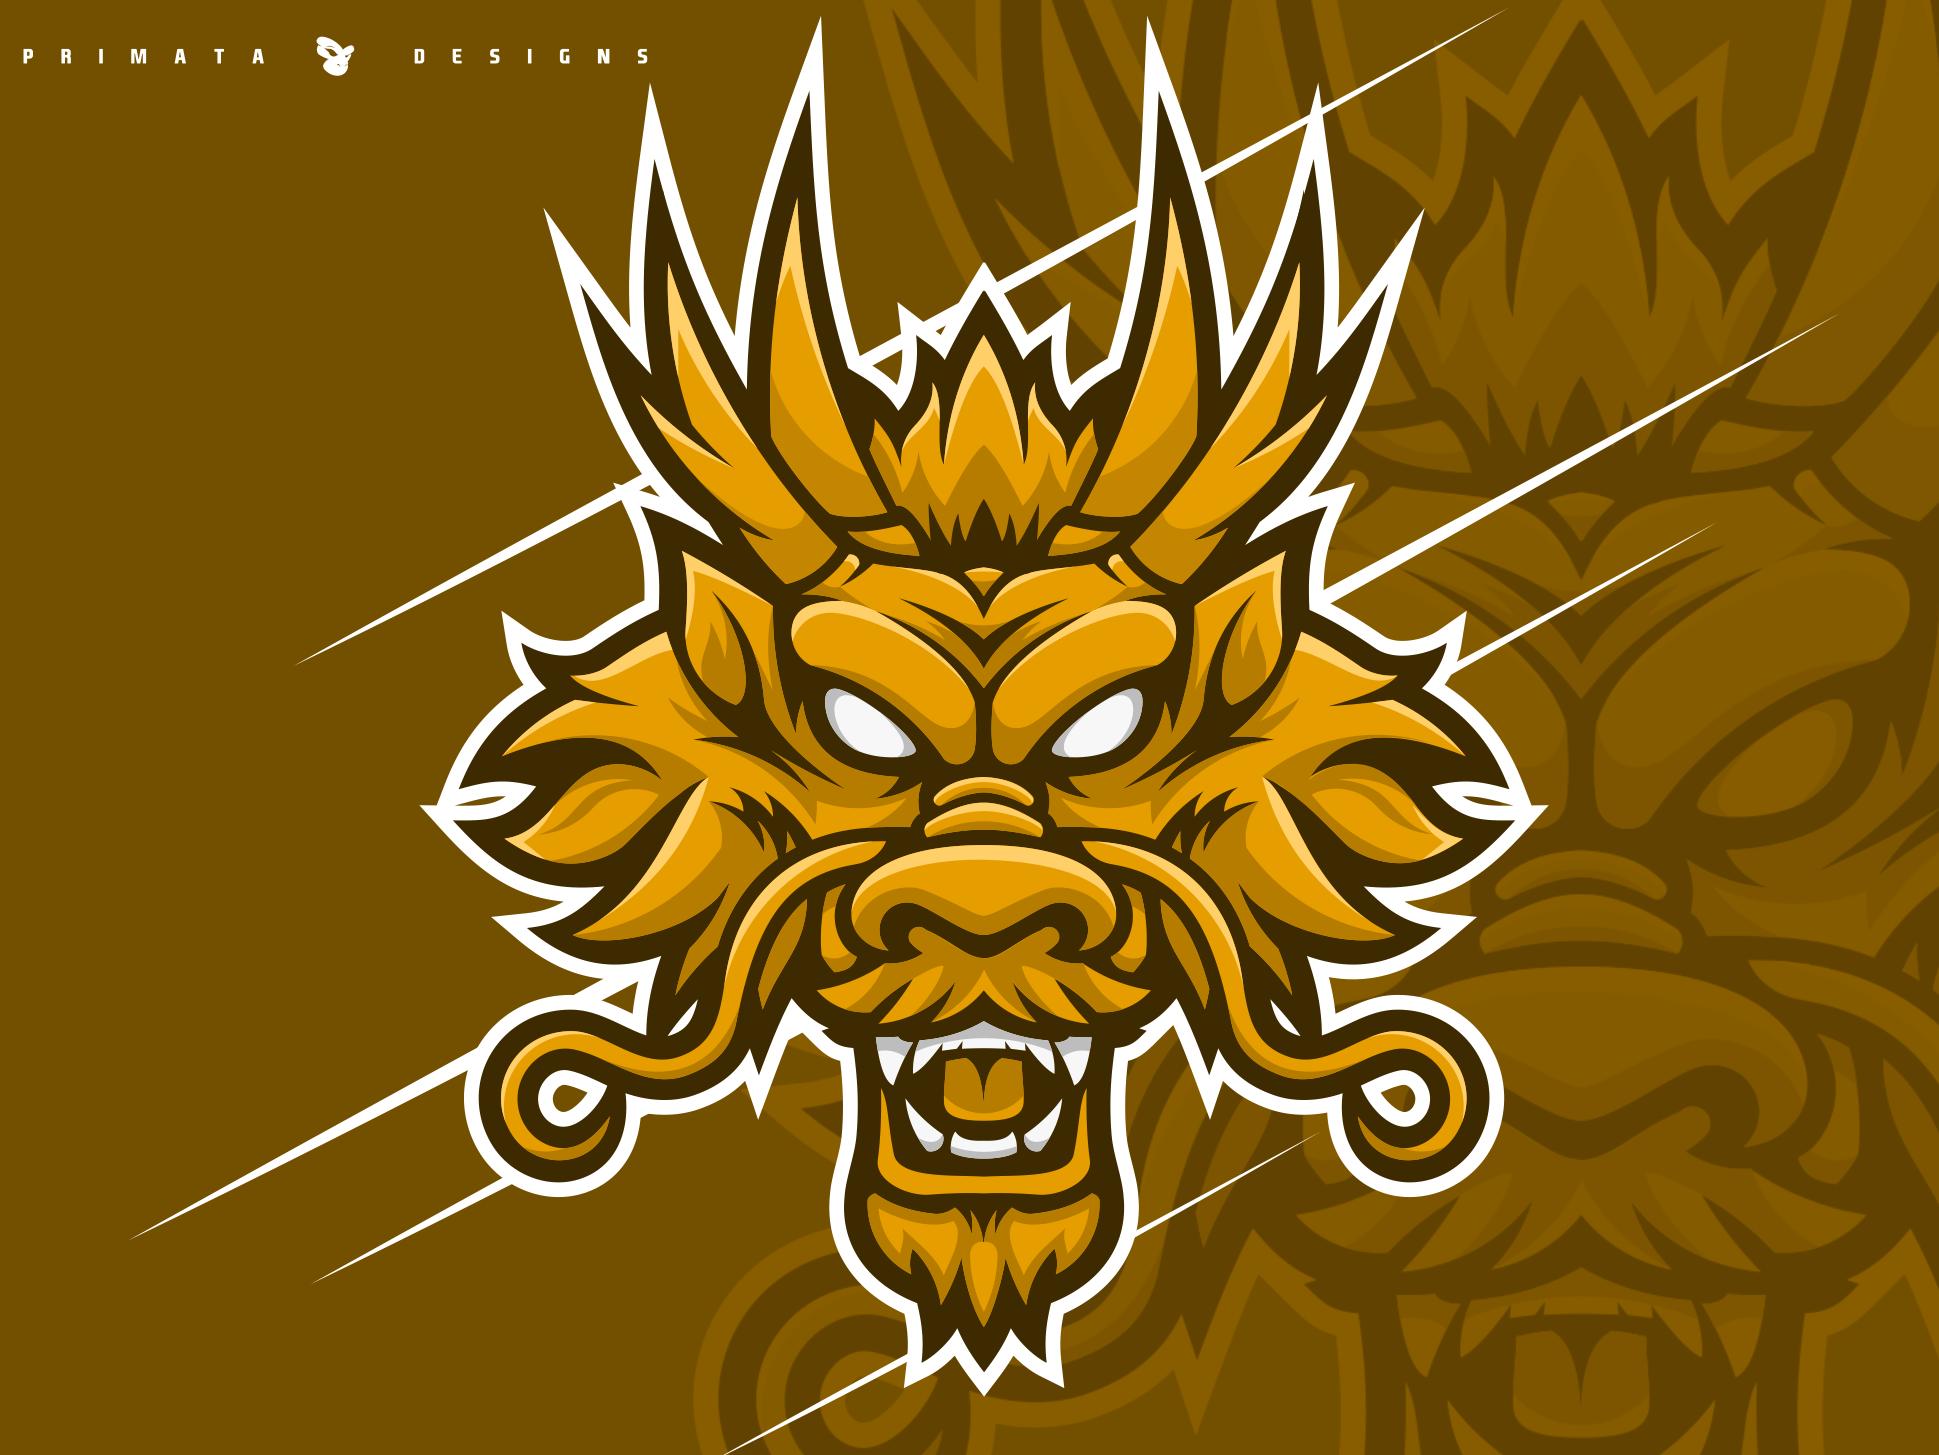 Ryujin Dragon in 2020 Game logo design, Illustration